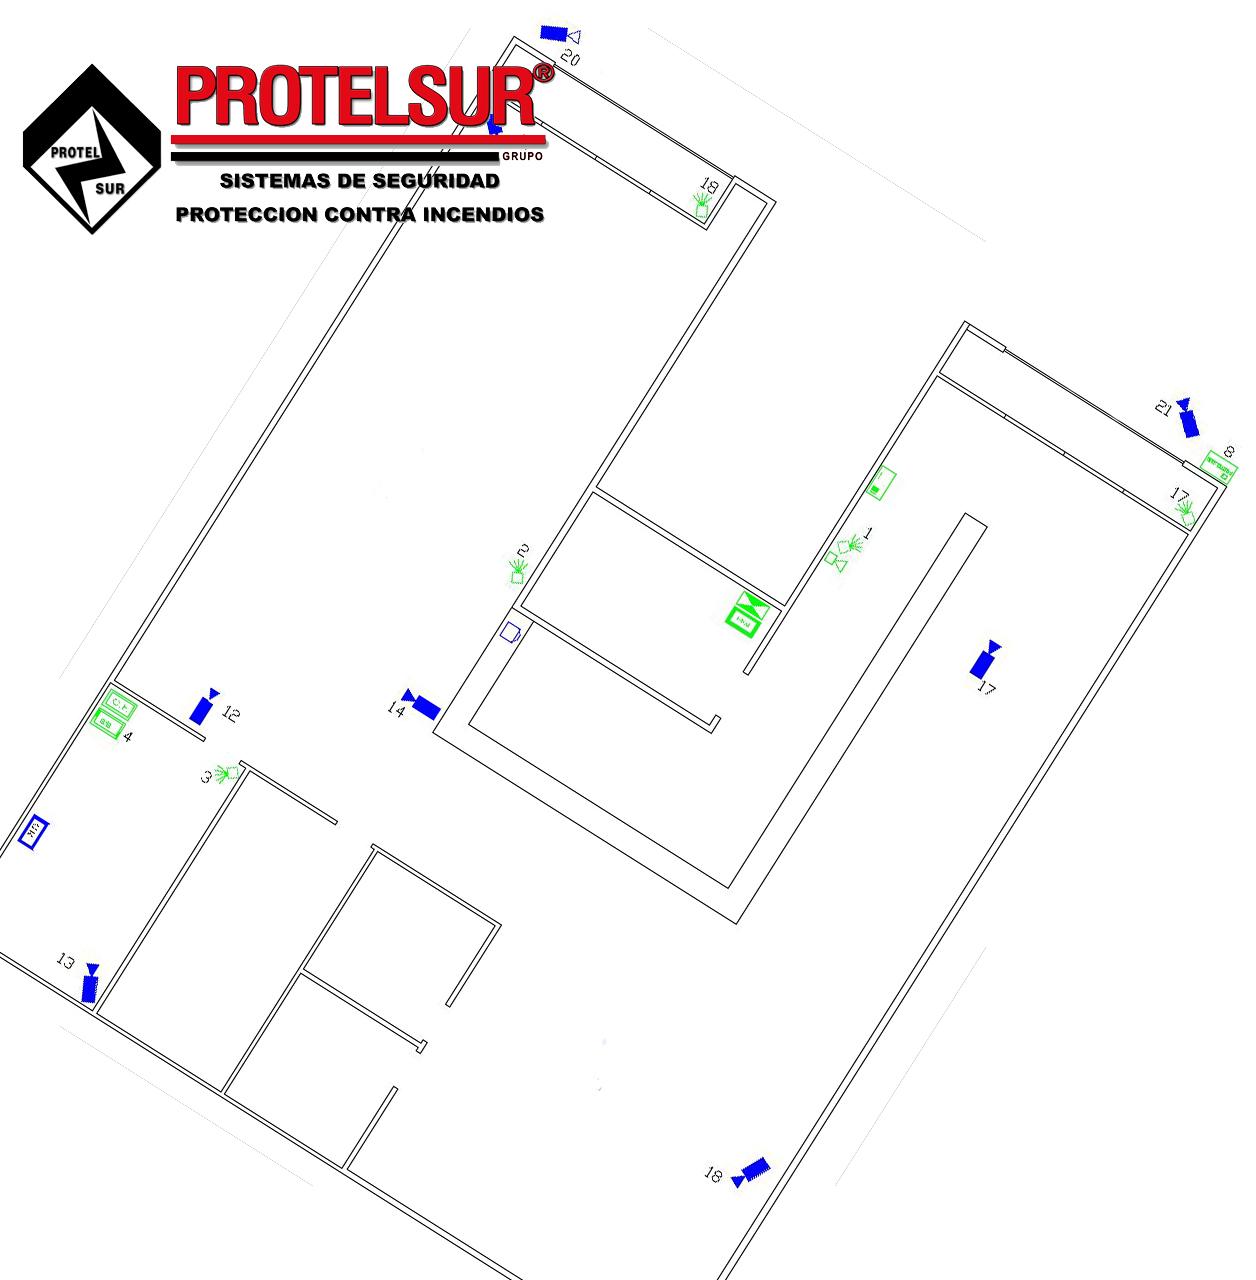 plano-ingenieria-protelsur